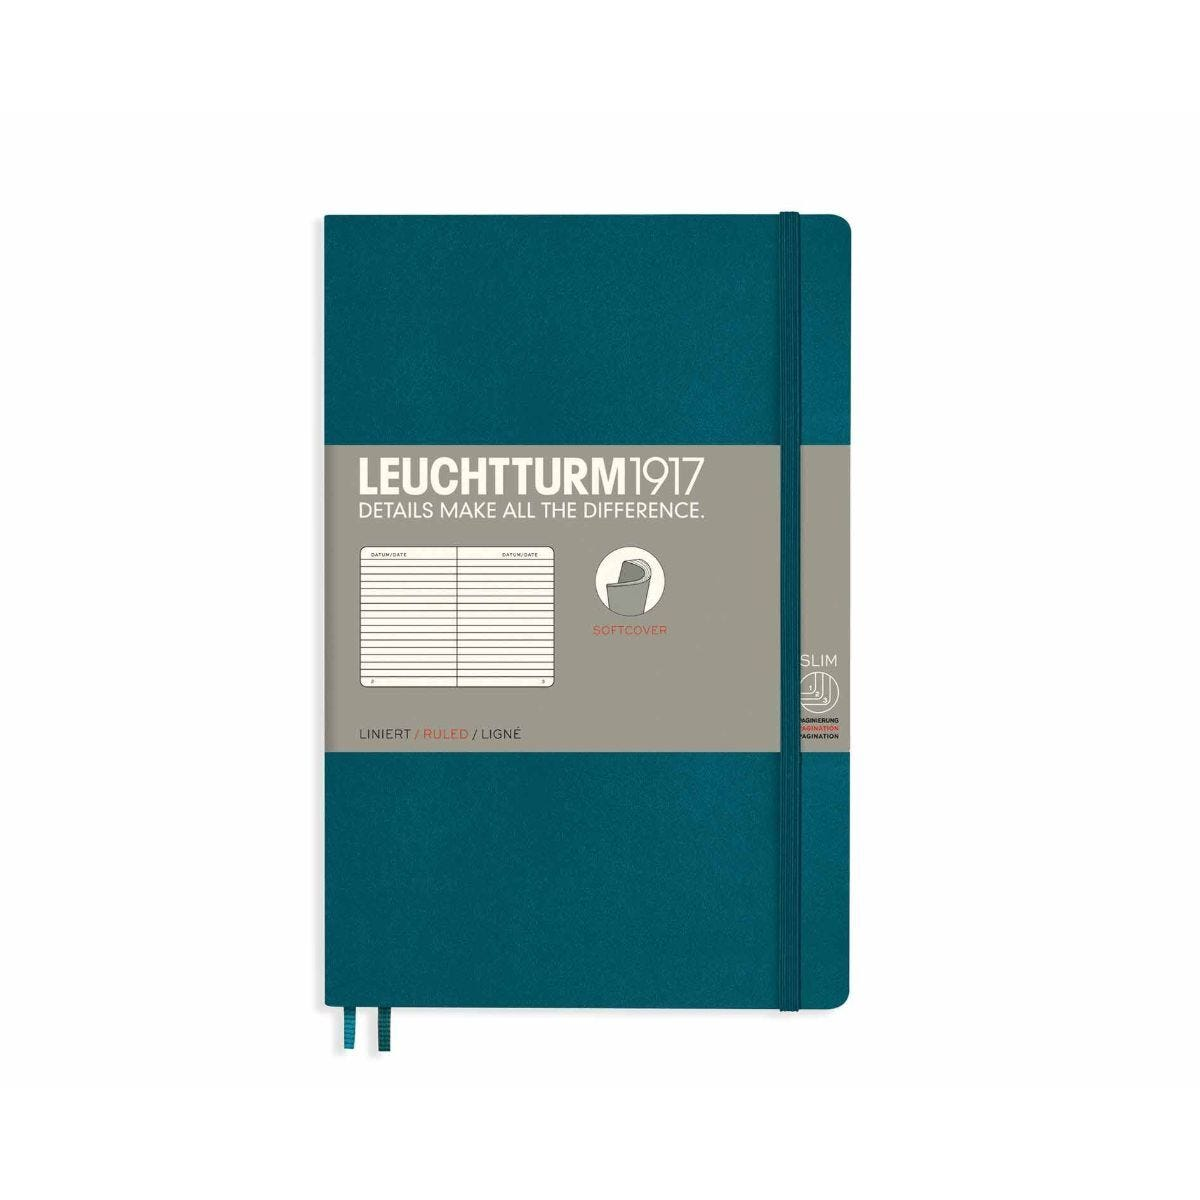 Leuchtturm1917 Soft Cover Notebook Ruled B6 Plus Emerald